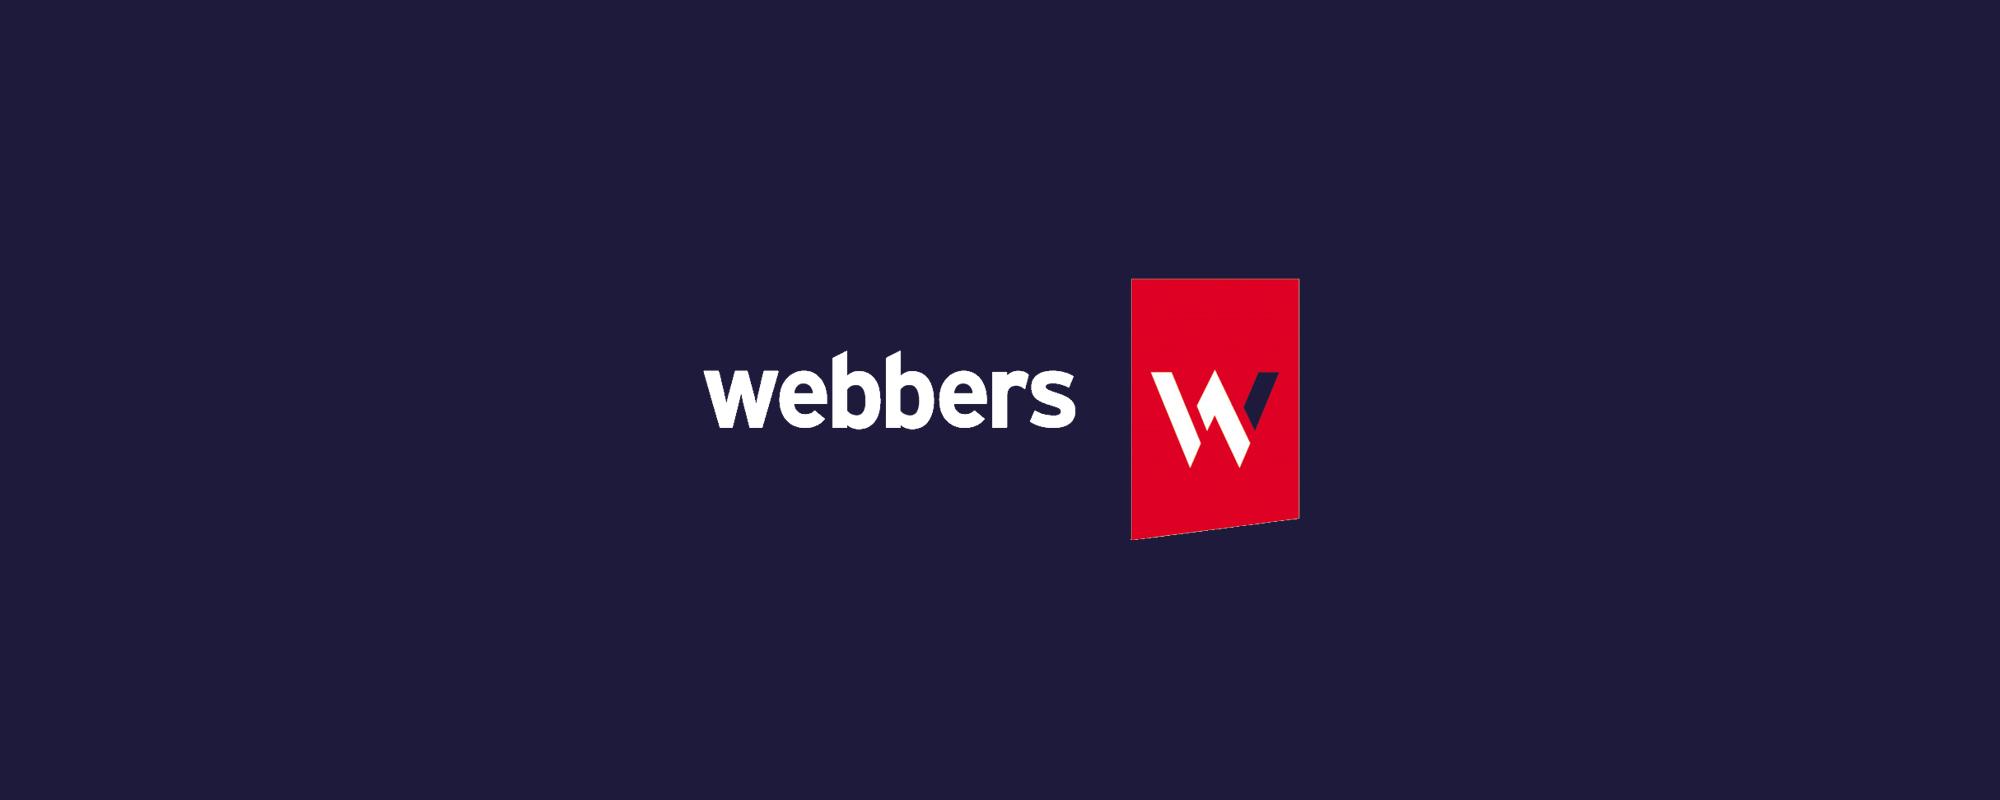 Webbers Cover Image.jpg